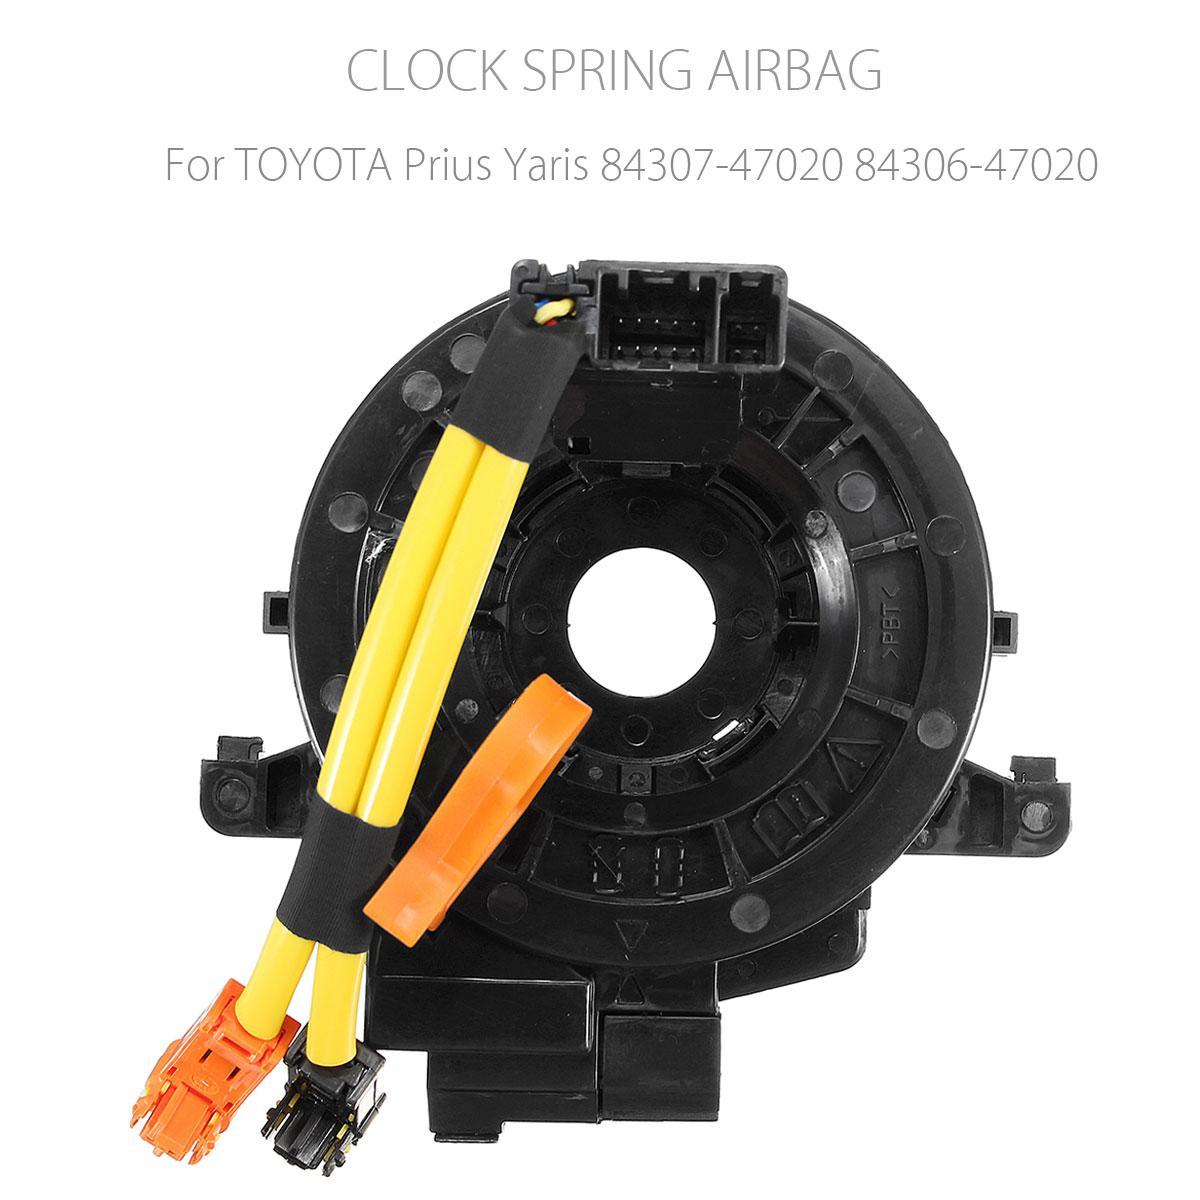 Clock Spring Airbag Untuk Toyota Prius Yaris-Internasional By Freebang